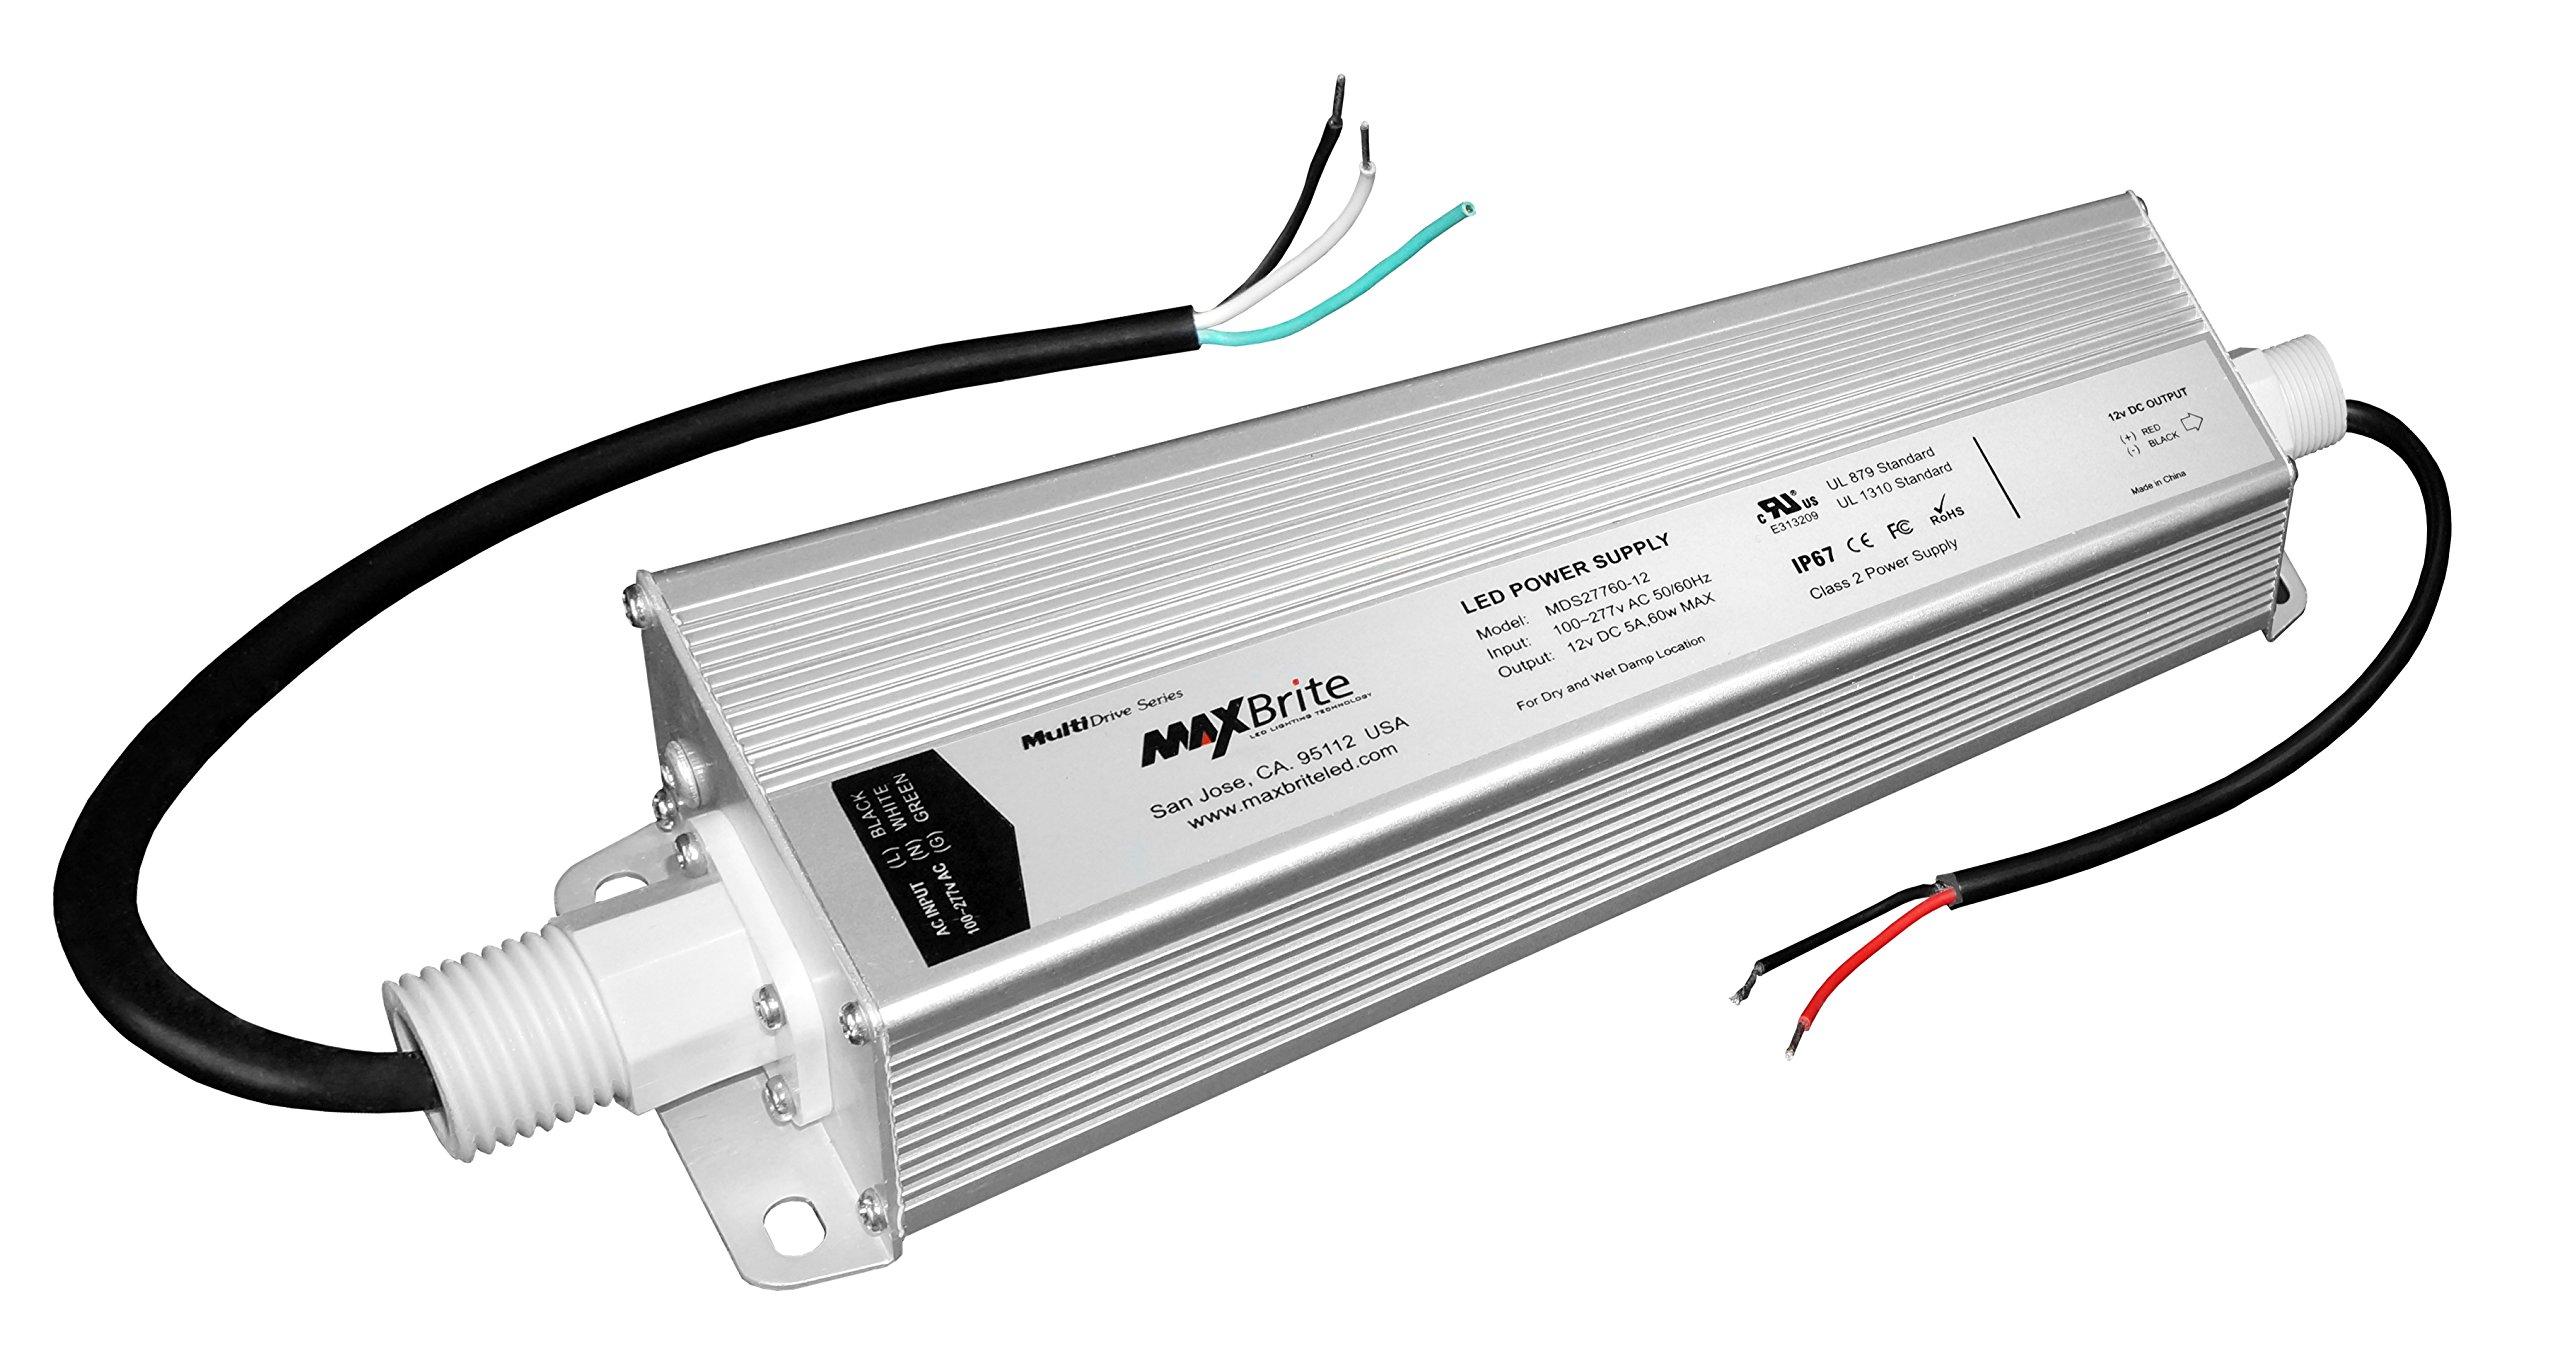 60W LED POWER SUPPLY, 12V DC Output, 100-277V AC Input, IP67 Waterproof, UL/cUL Certified, CE, RoHS, Class 2